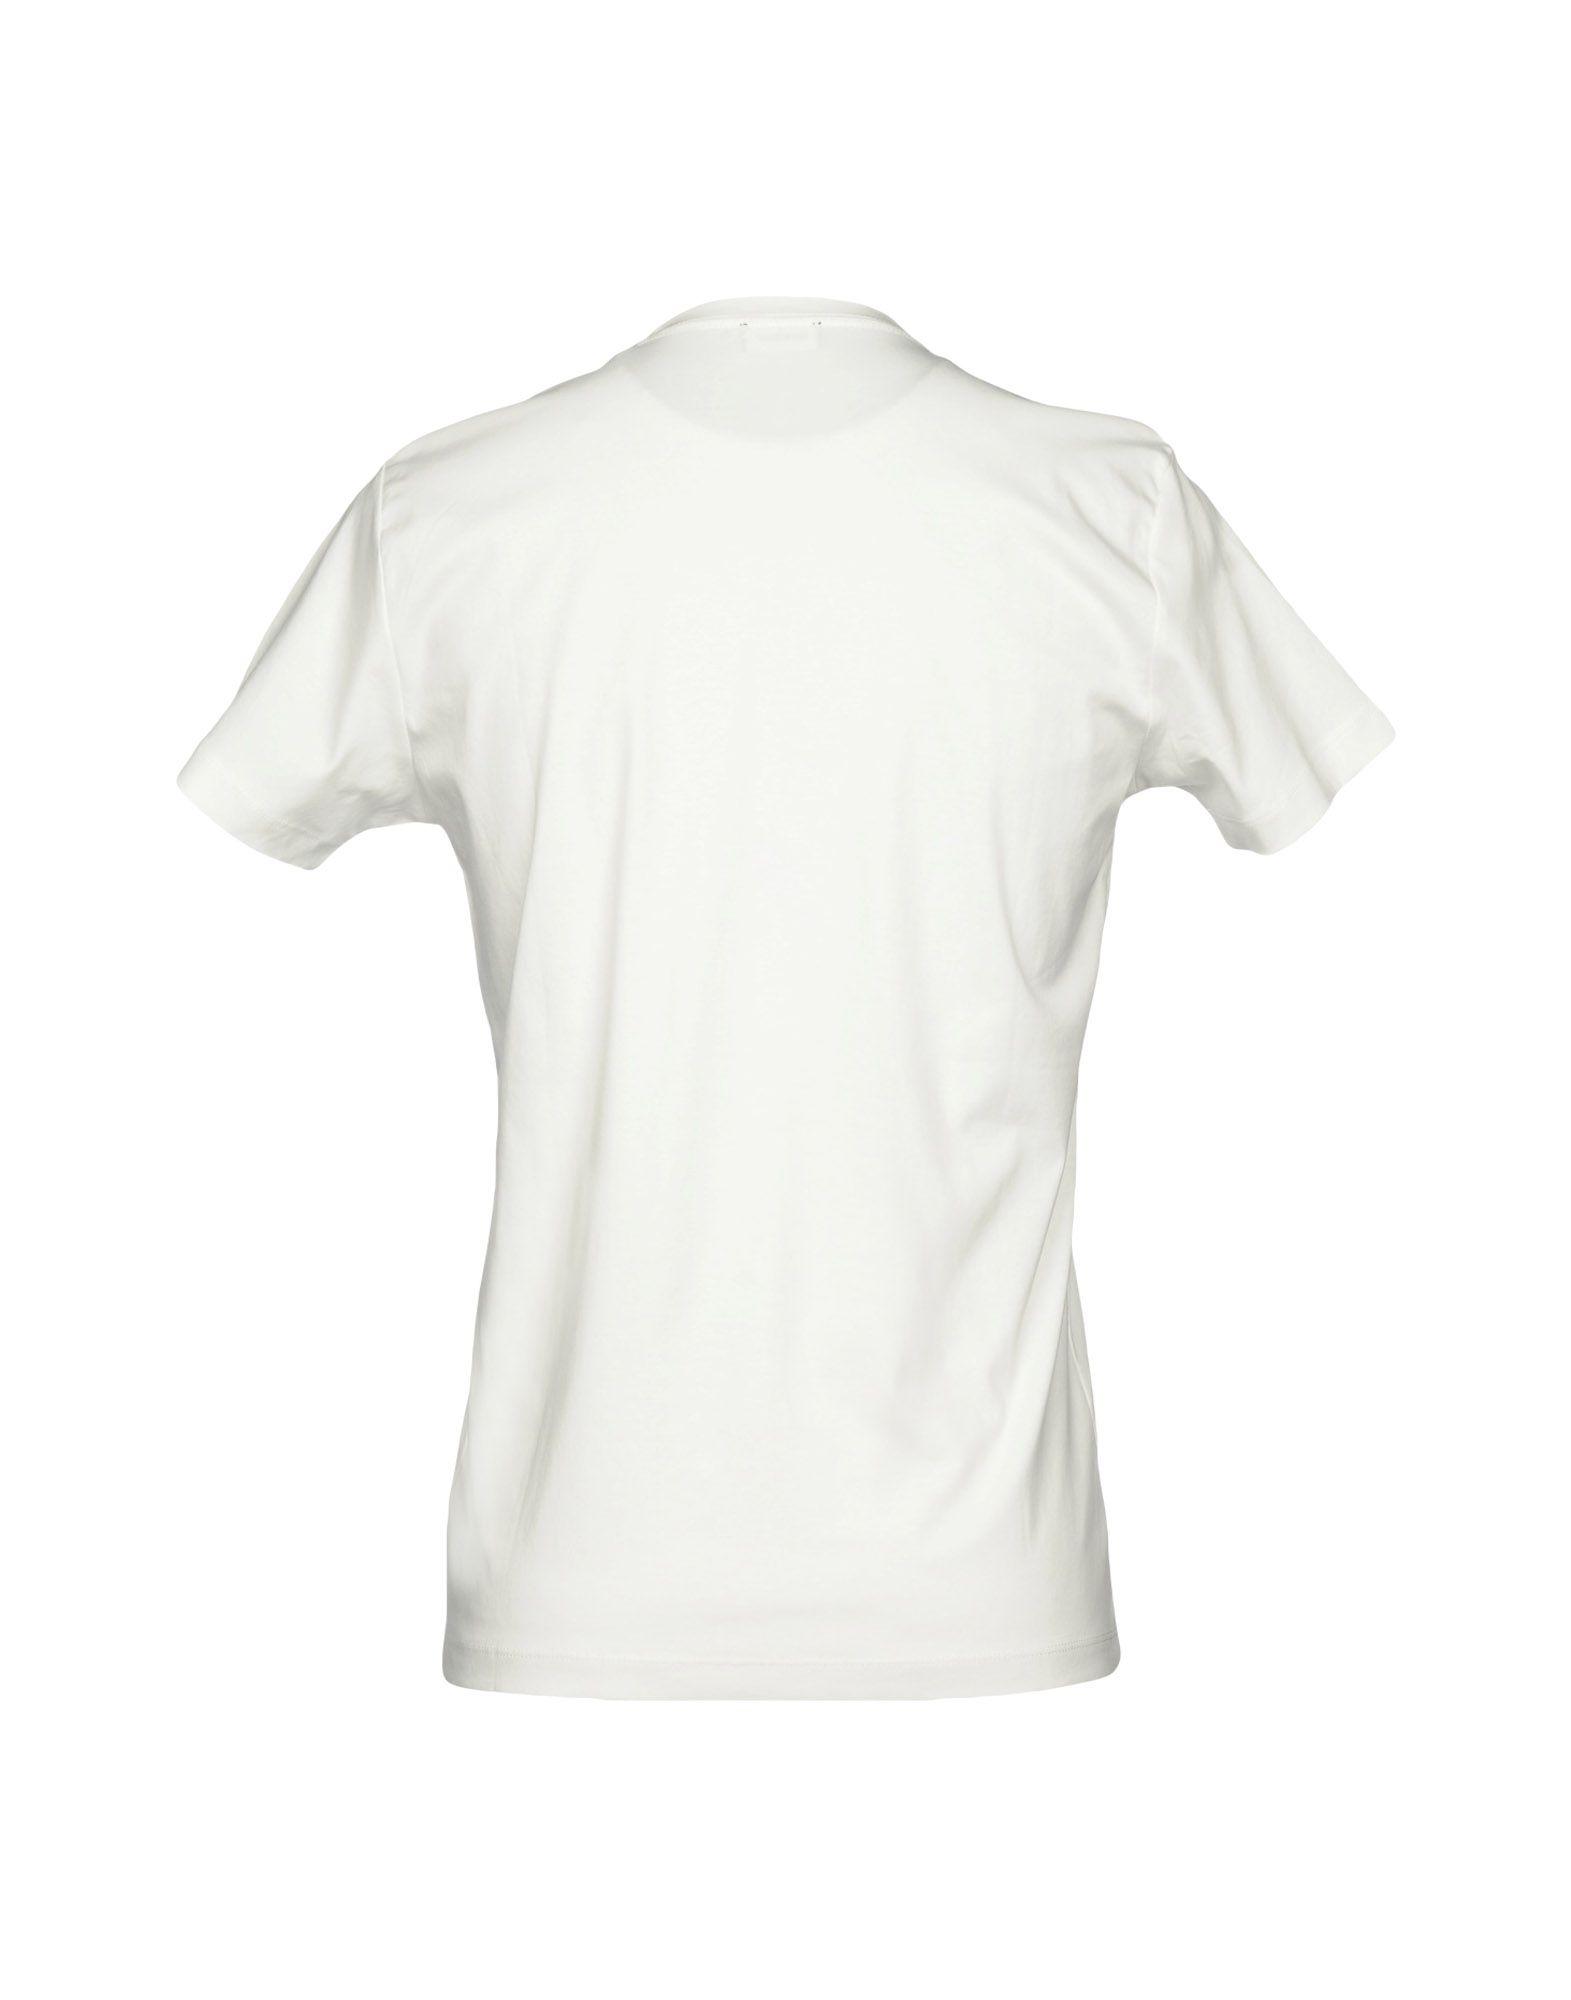 A Uomo buon mercato T-Shirt Diesel Uomo A - 12132281AH 358c82